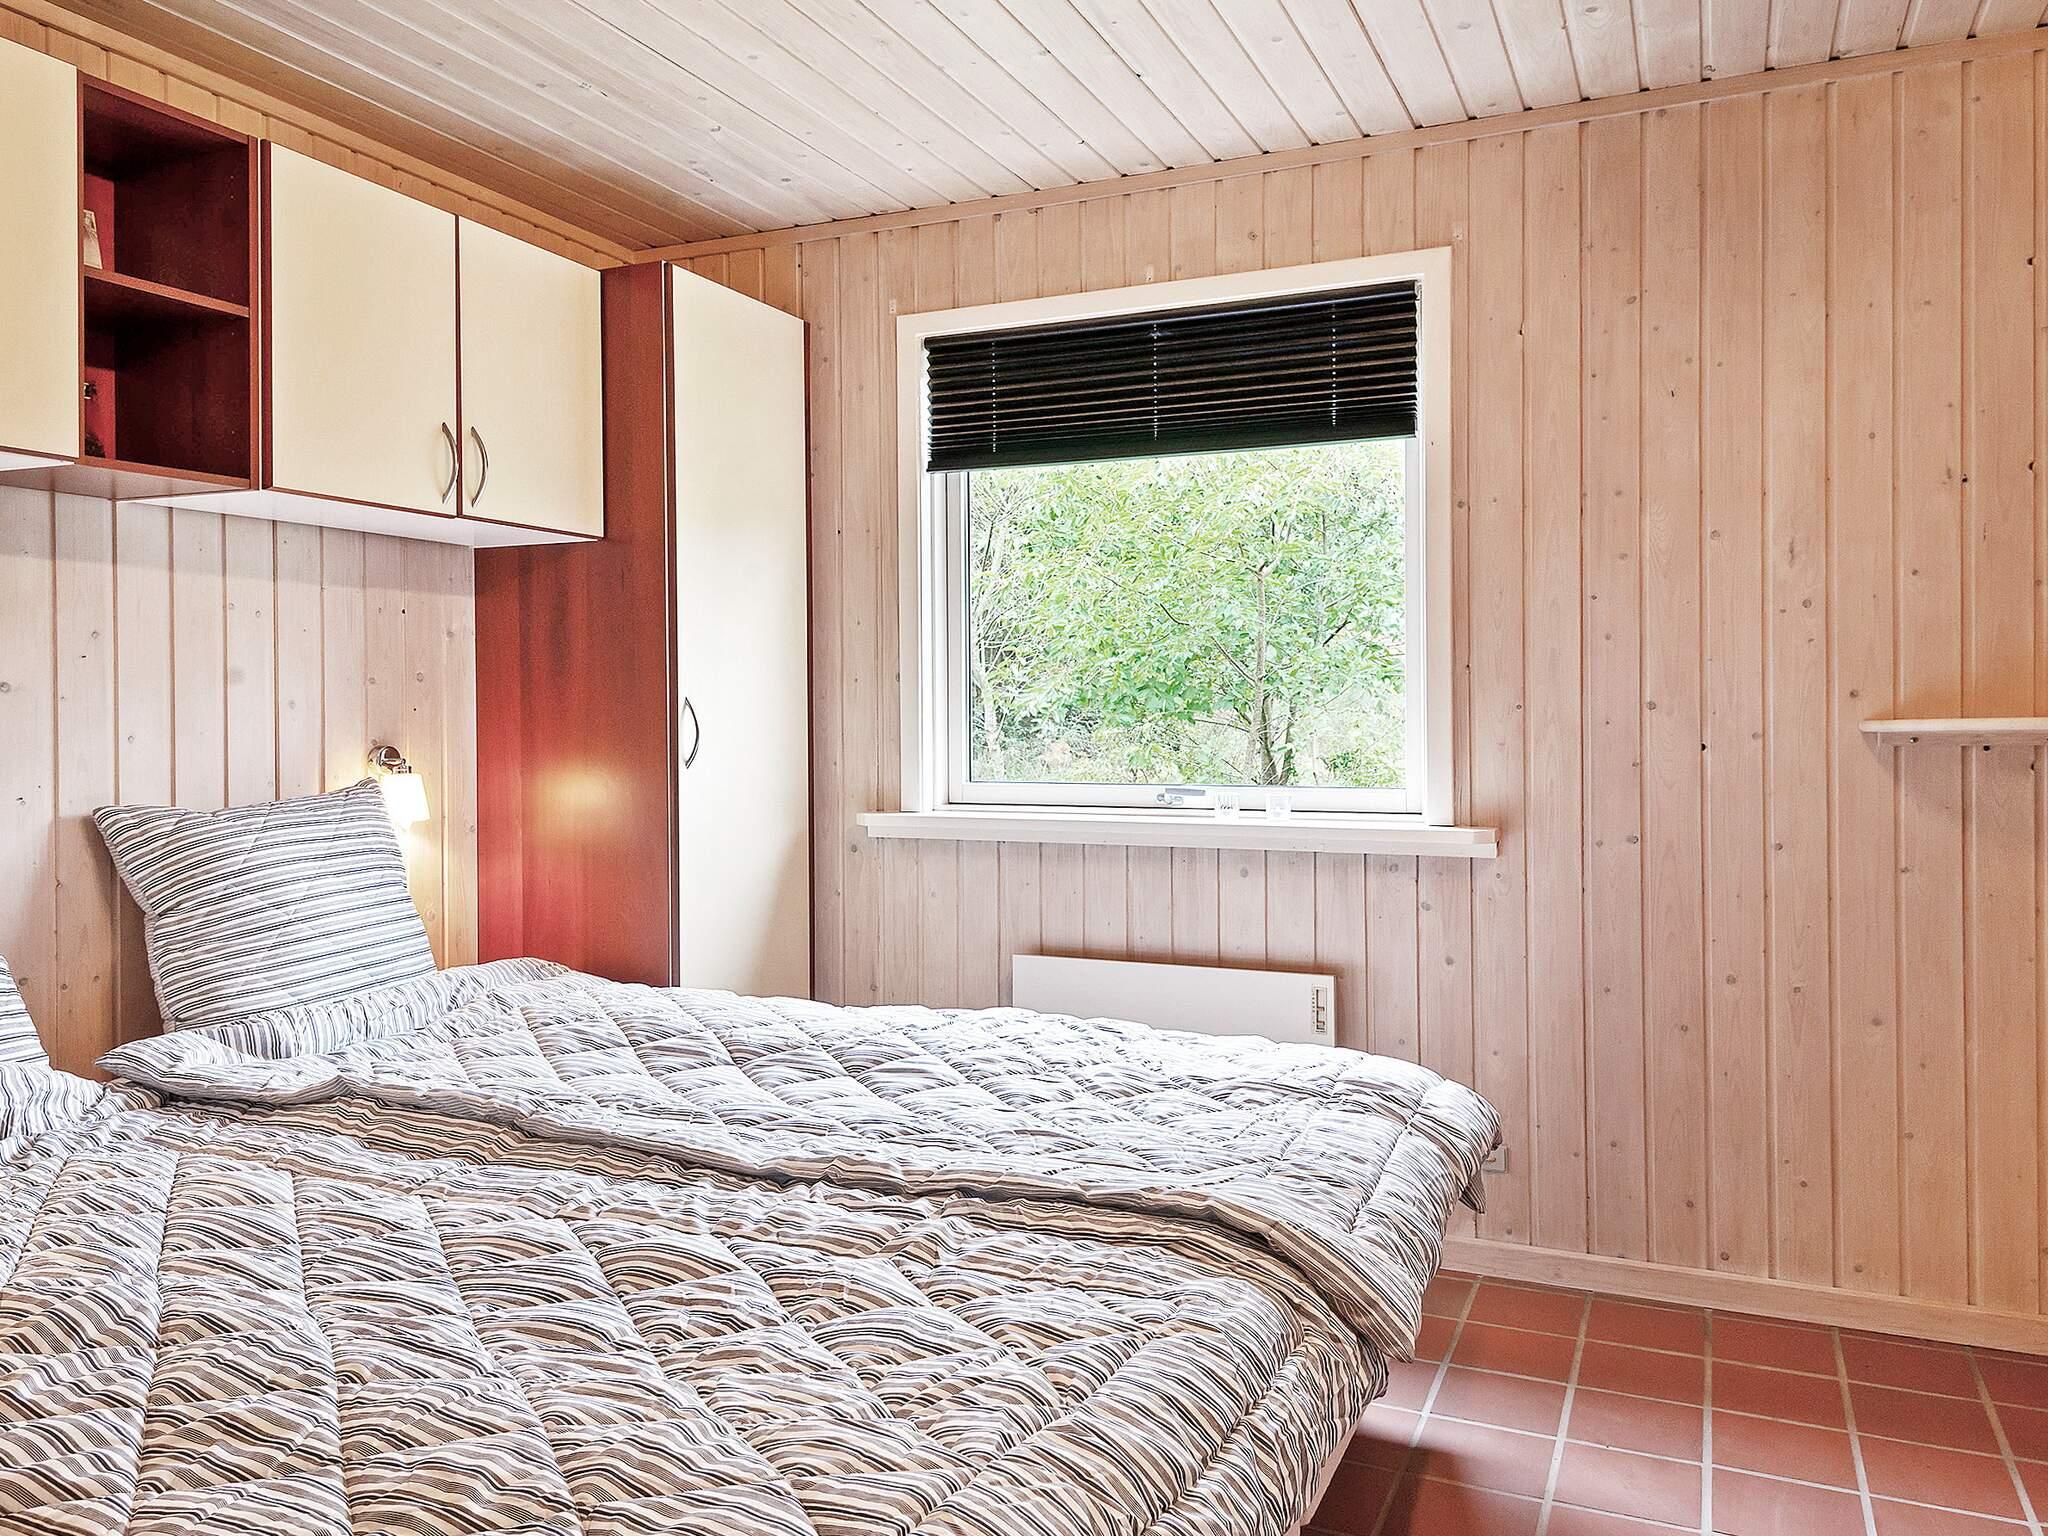 Ferienhaus Virksund (2561596), Virksund, , Limfjord, Dänemark, Bild 13